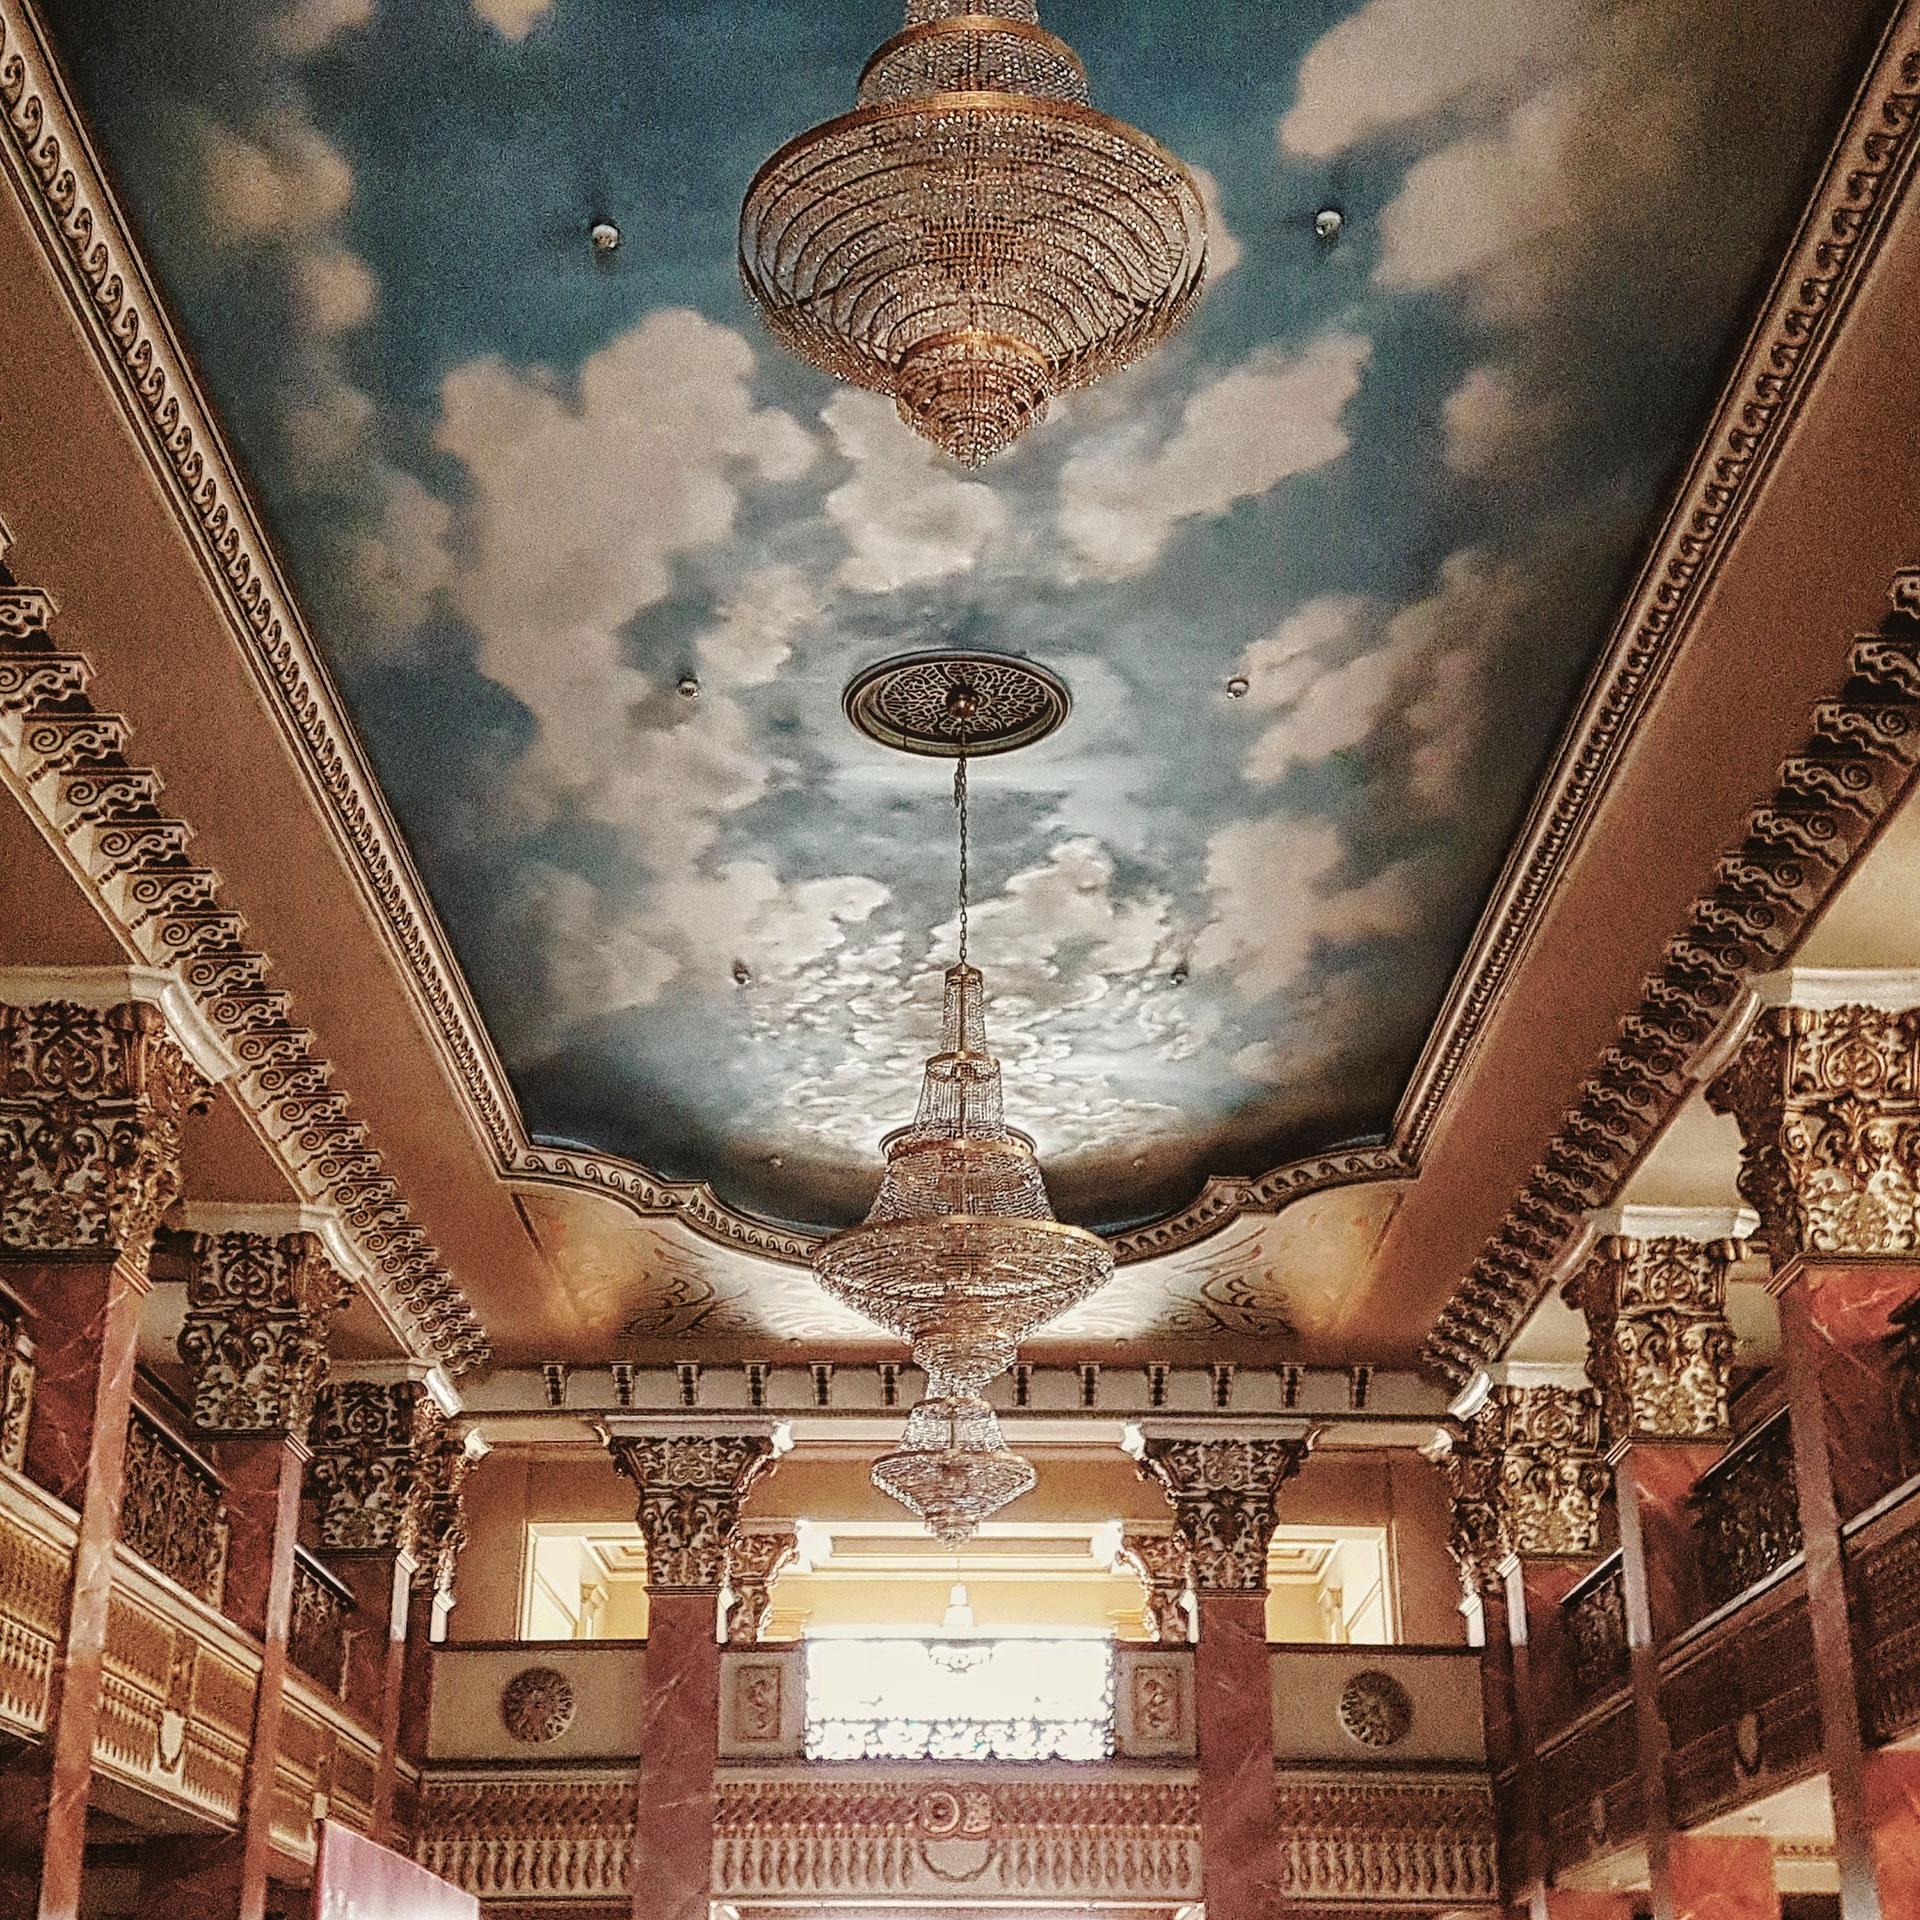 Almaty-Theatre-2017-02-05